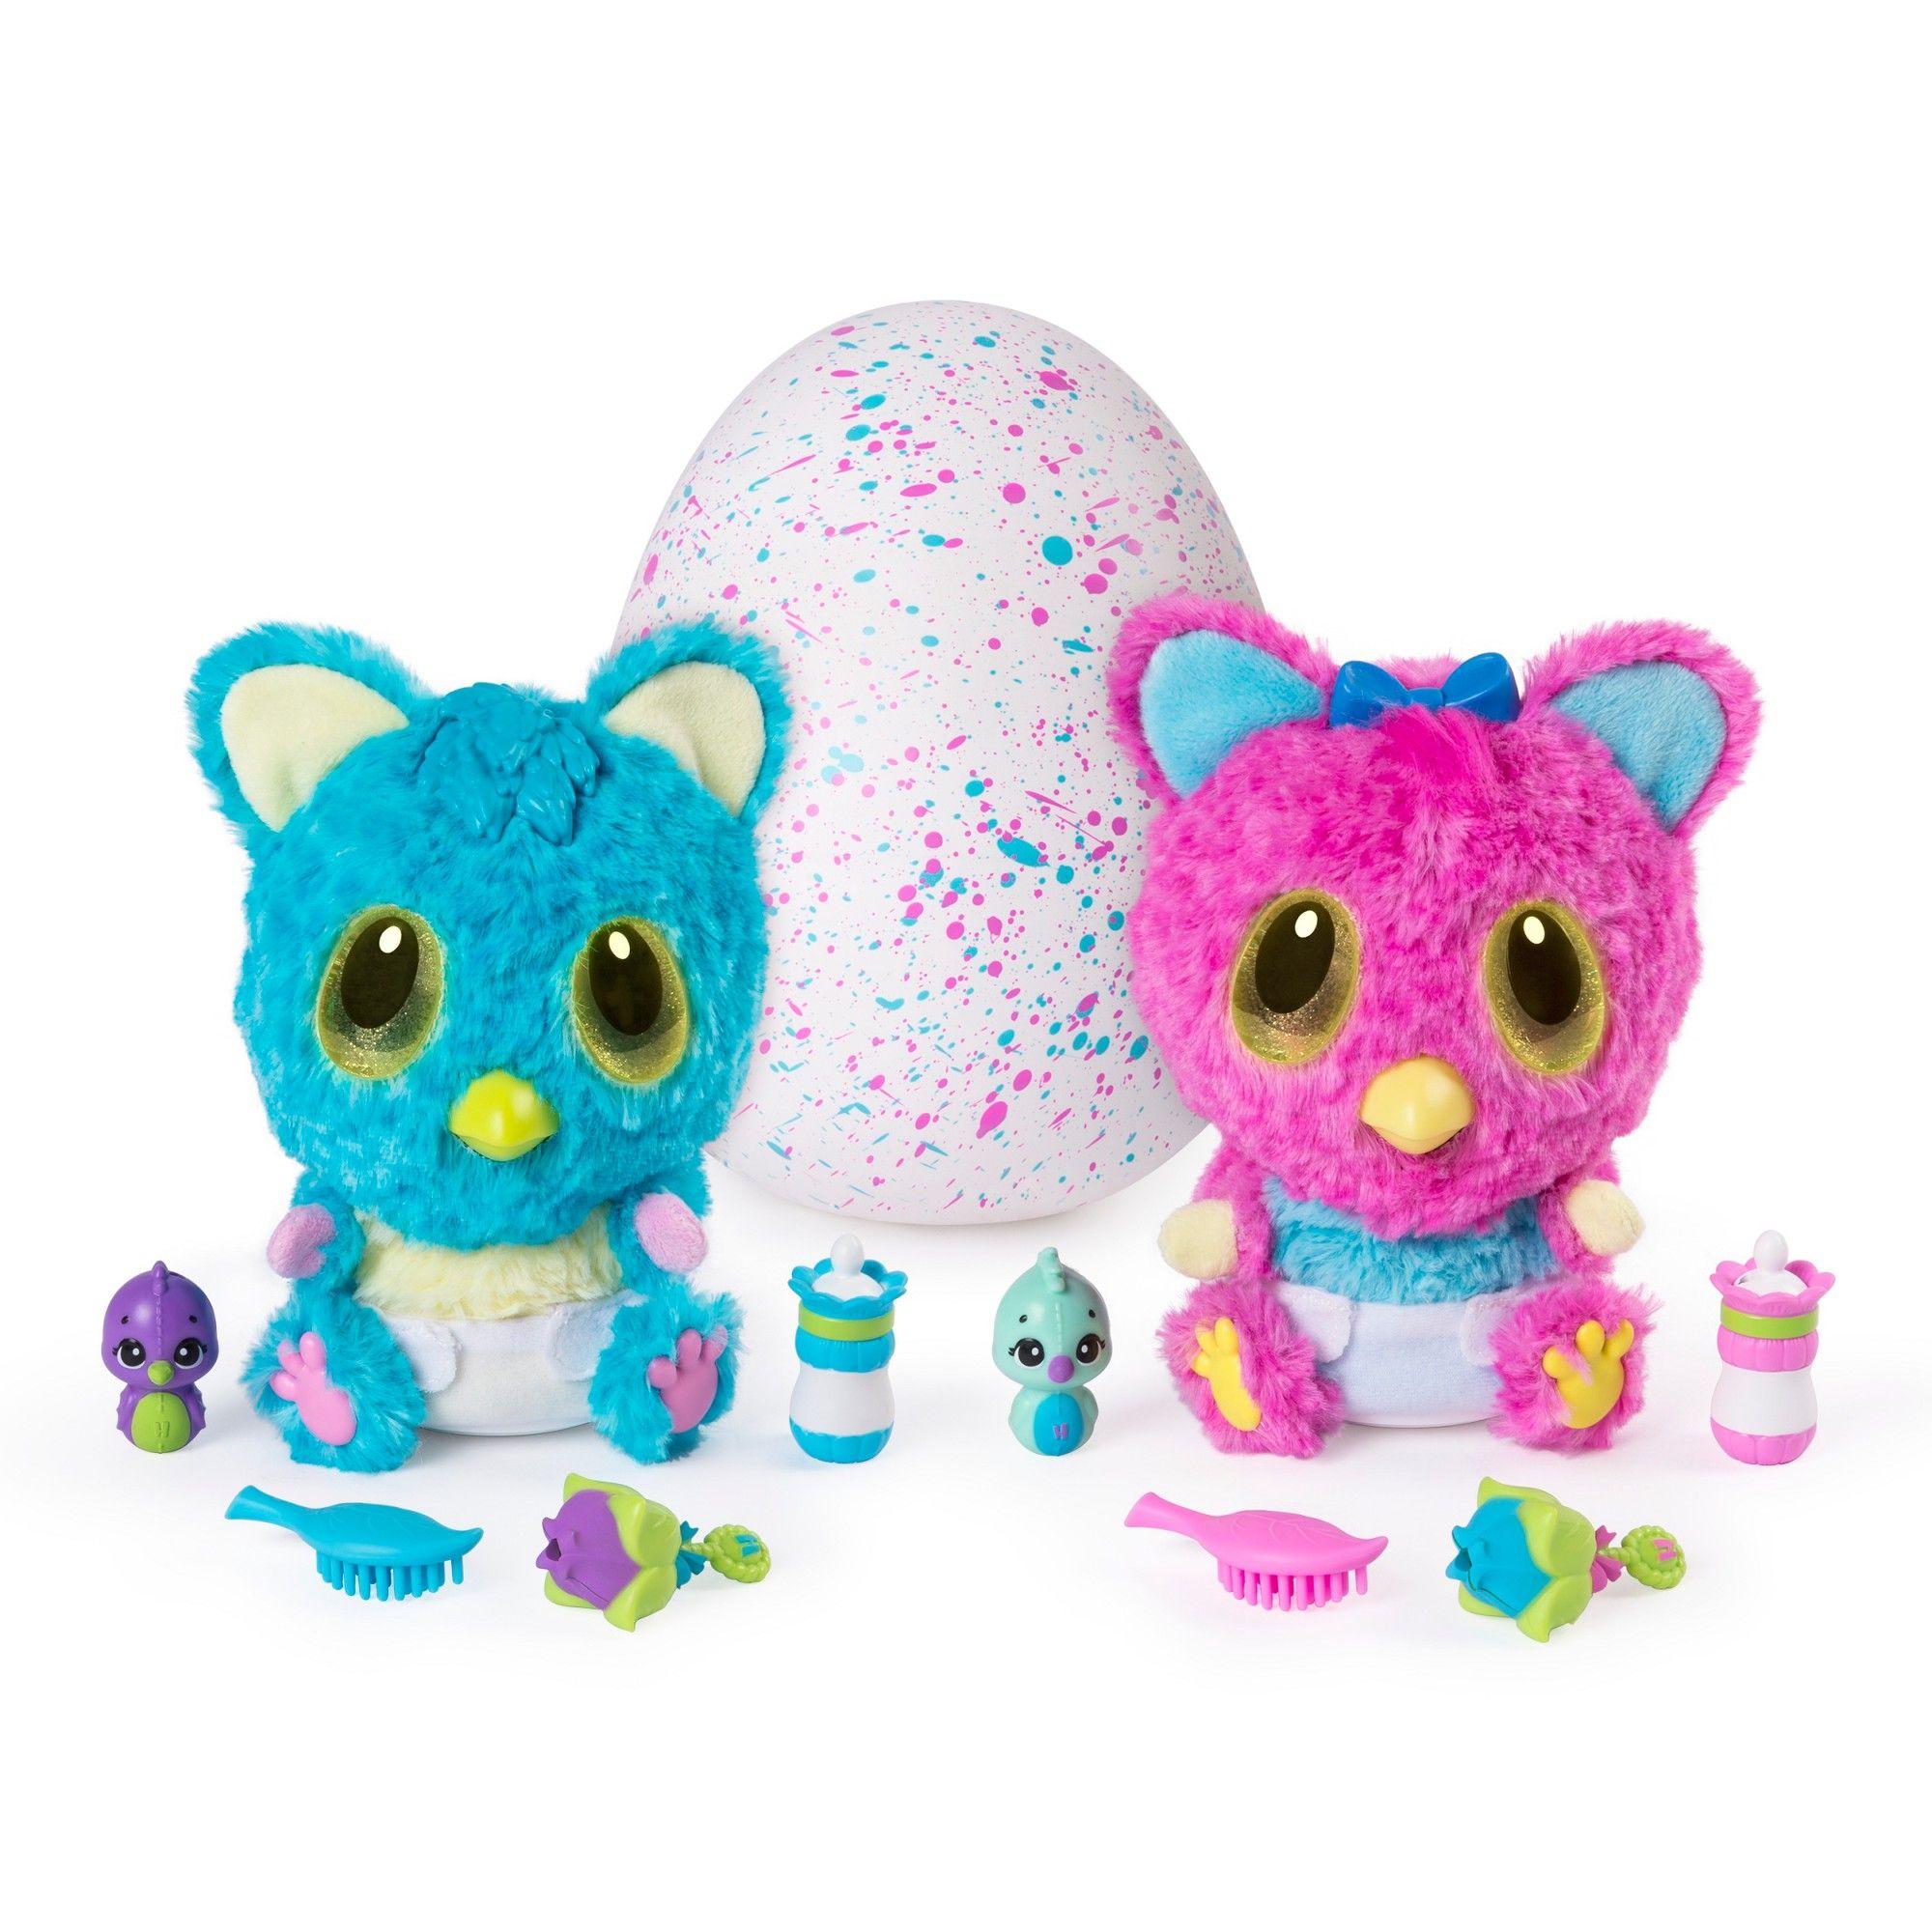 Hatchimals Hatchibabies Cheetree Holiday Toys Hatchimals Hatching Egg Toy